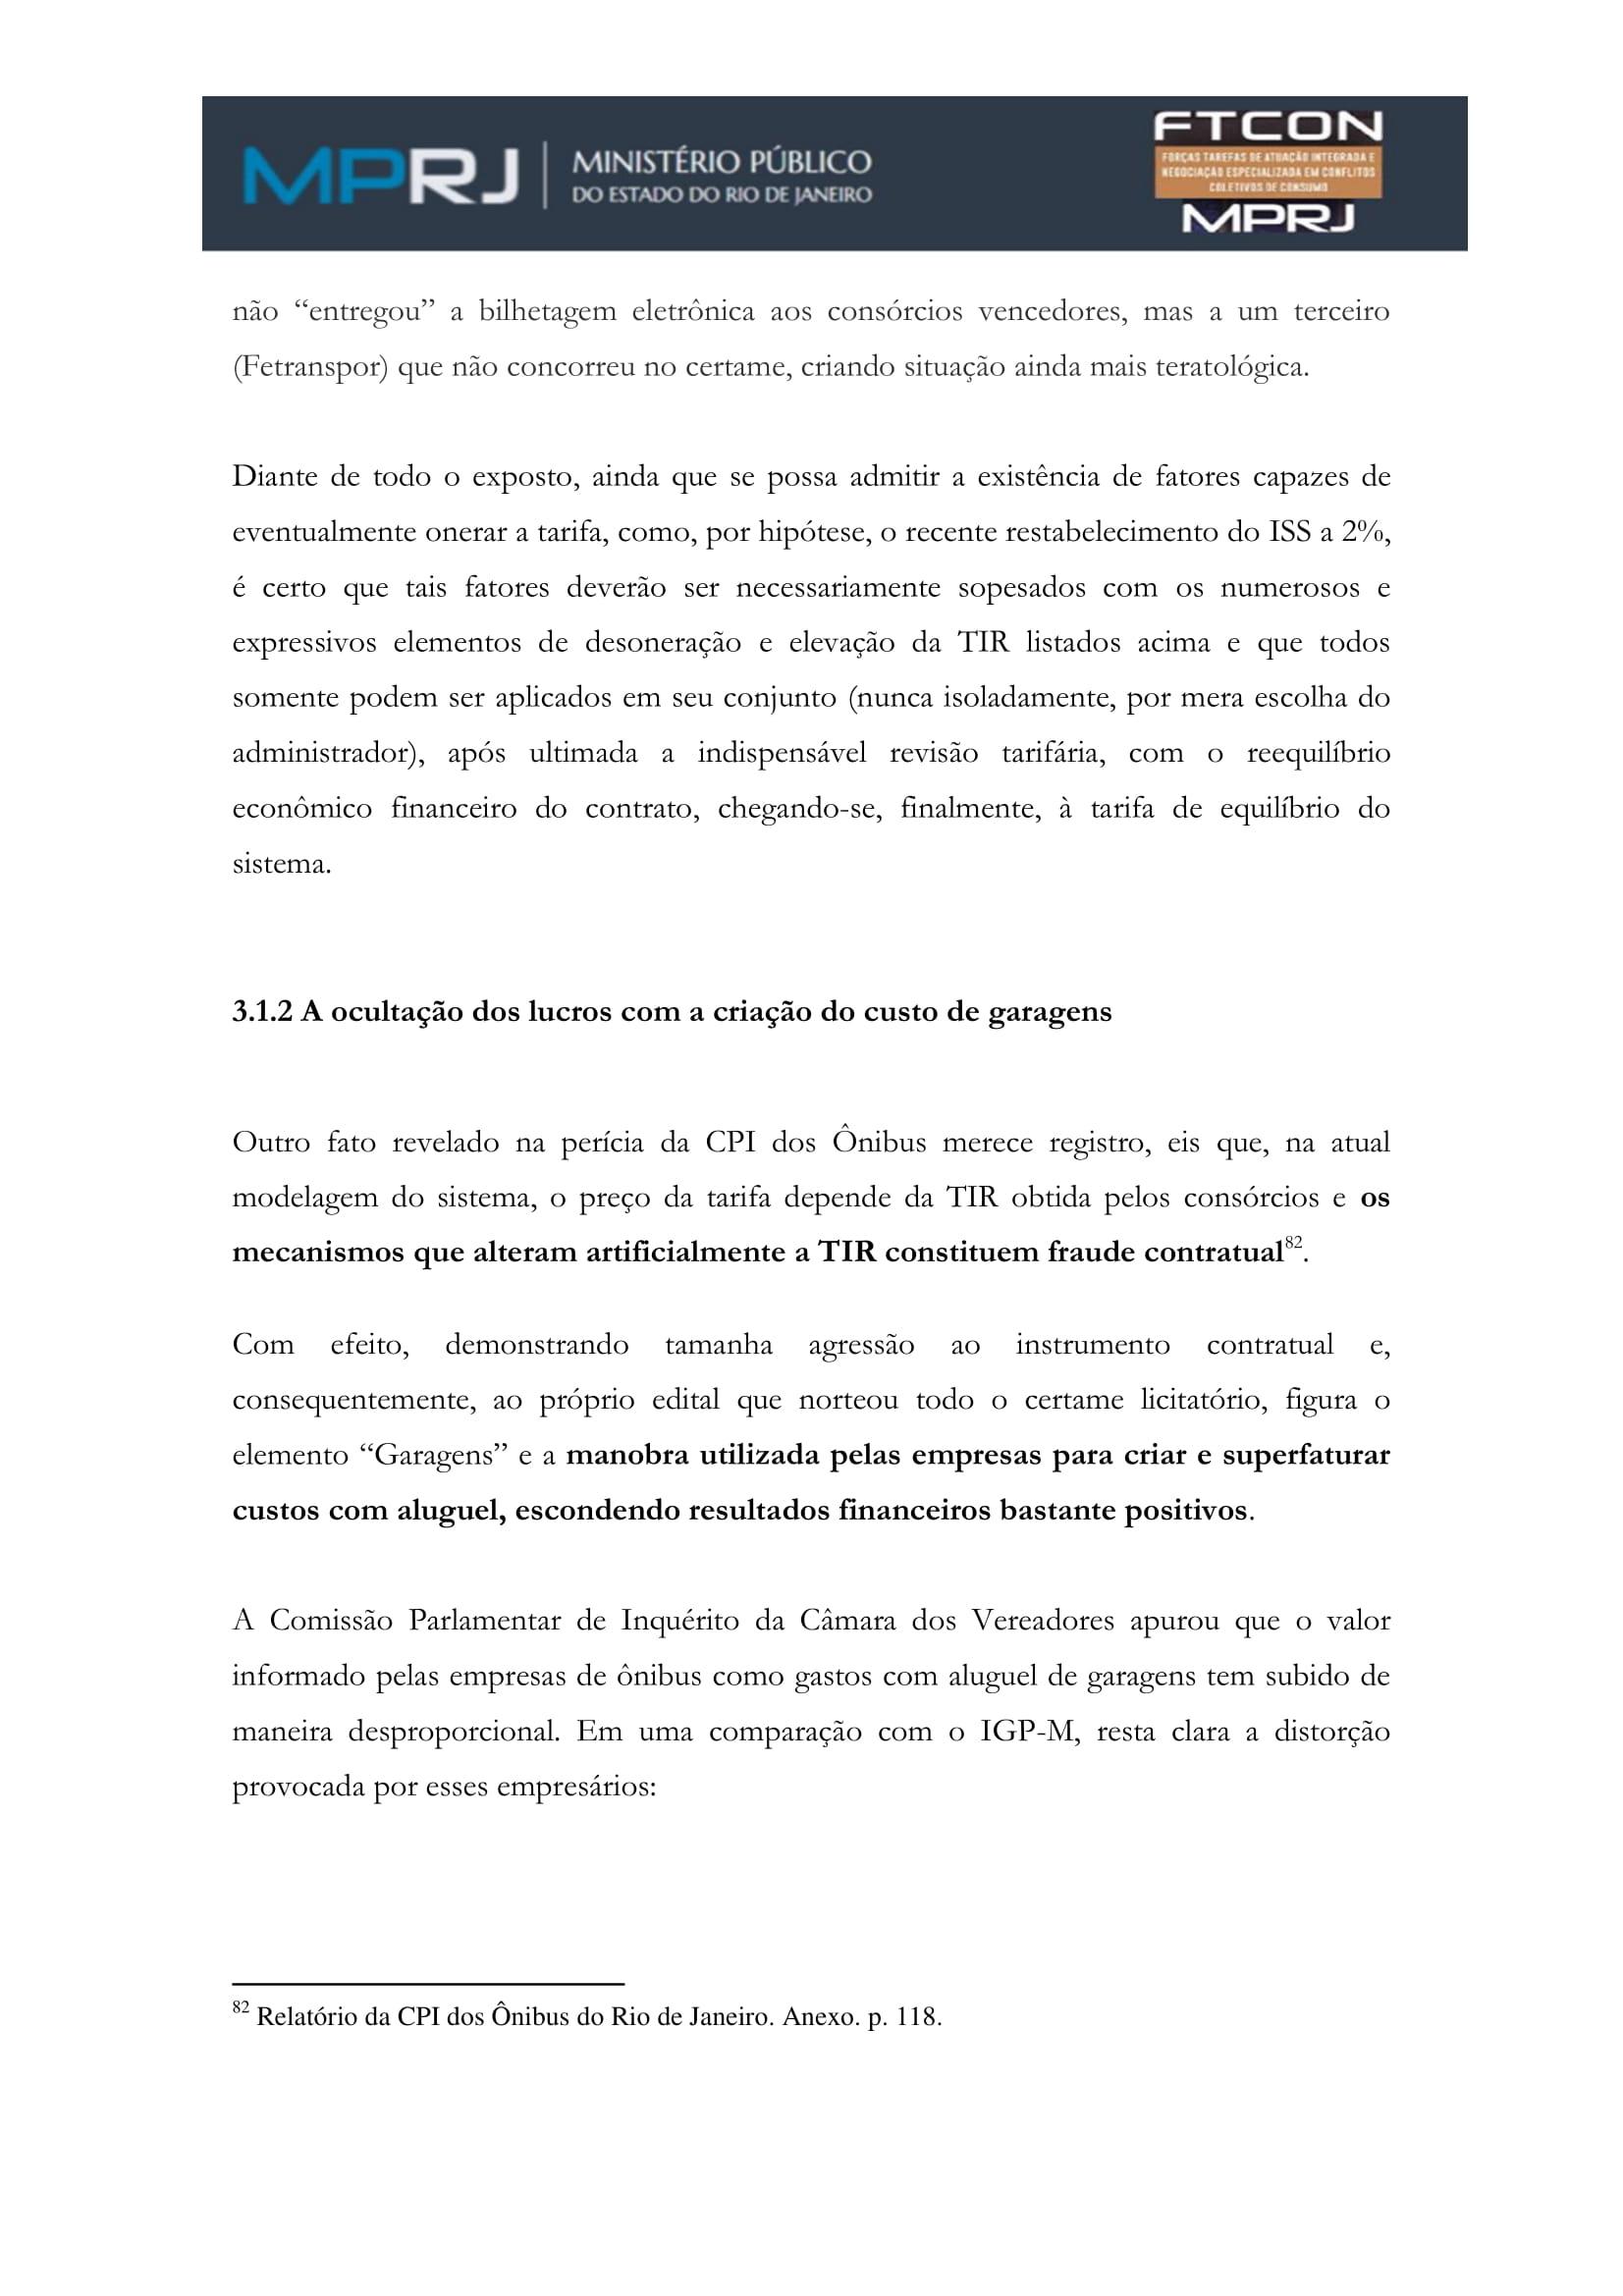 acp_caducidade_onibus_dr_rt-088